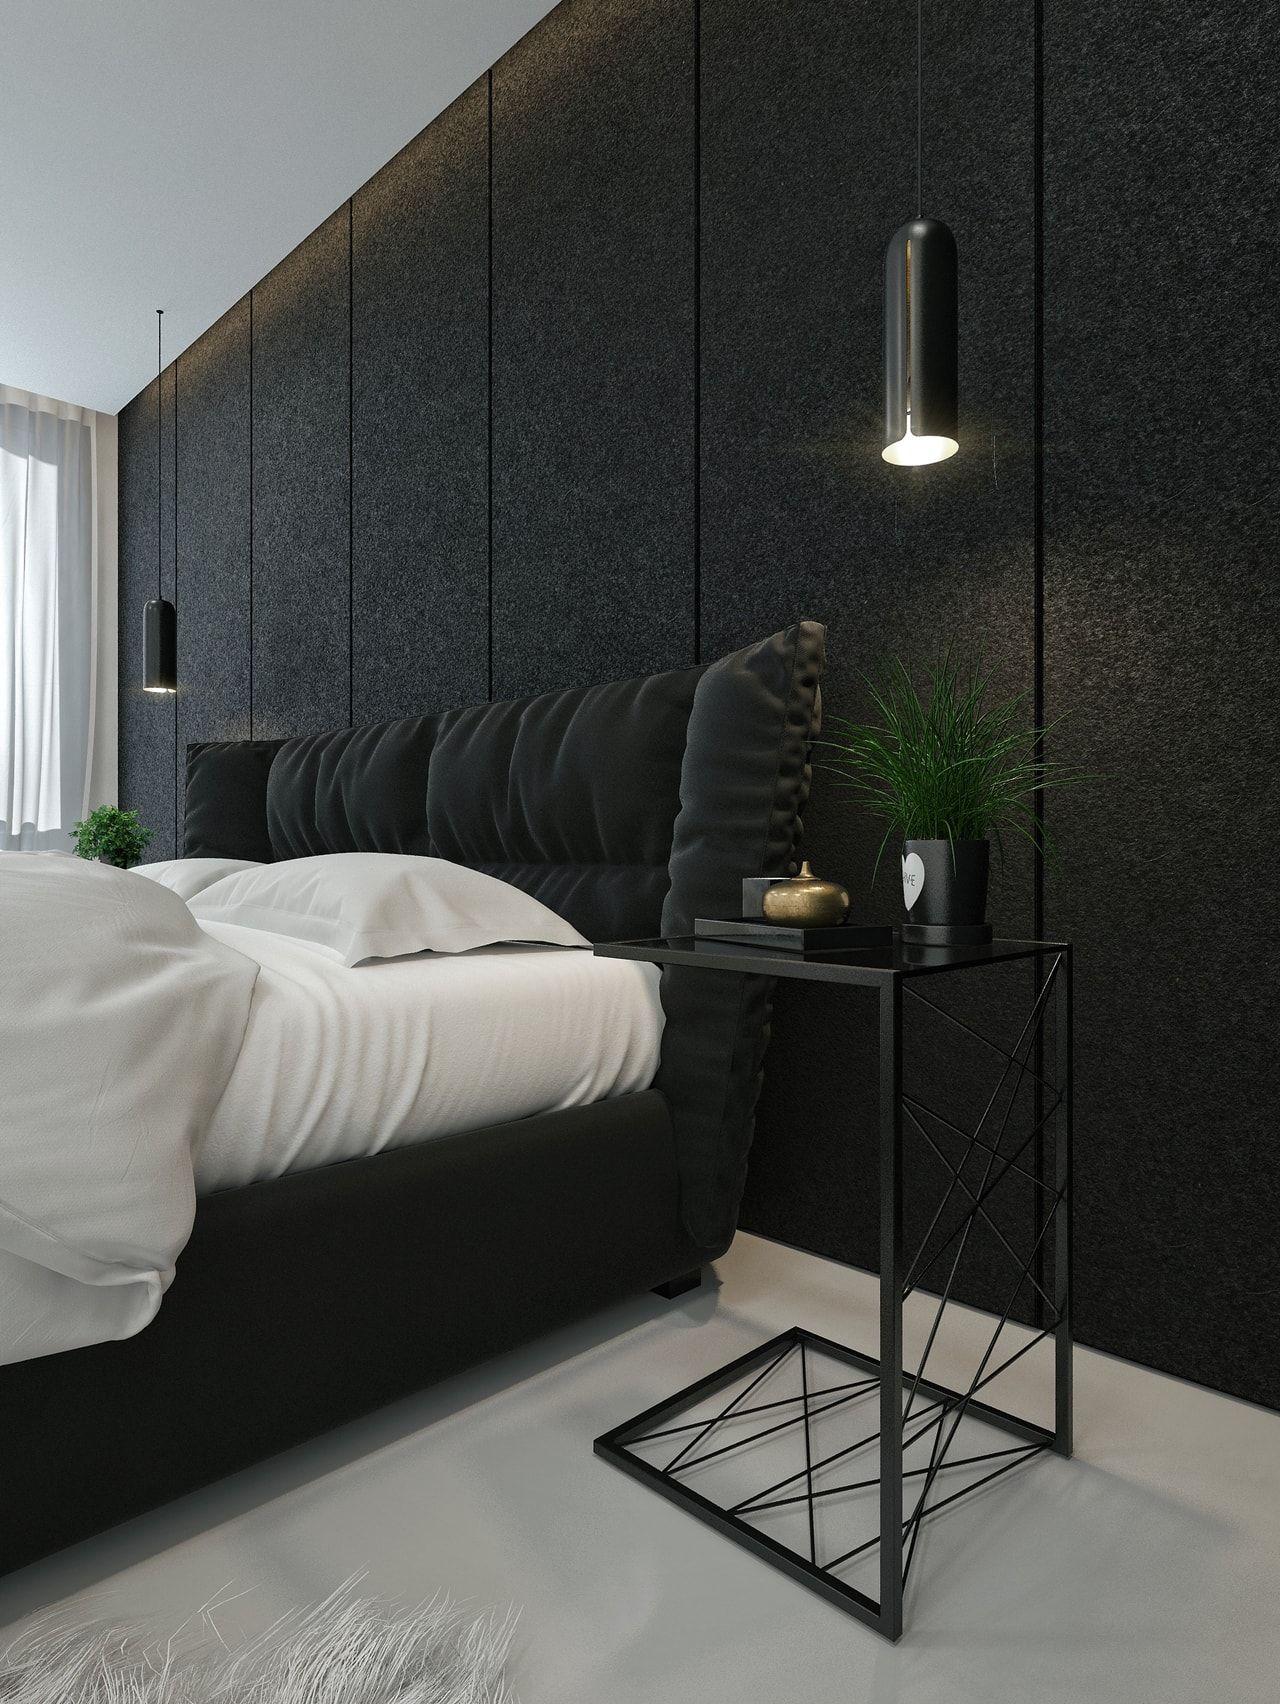 Black And White Home Interior Design For Luxury Home Black